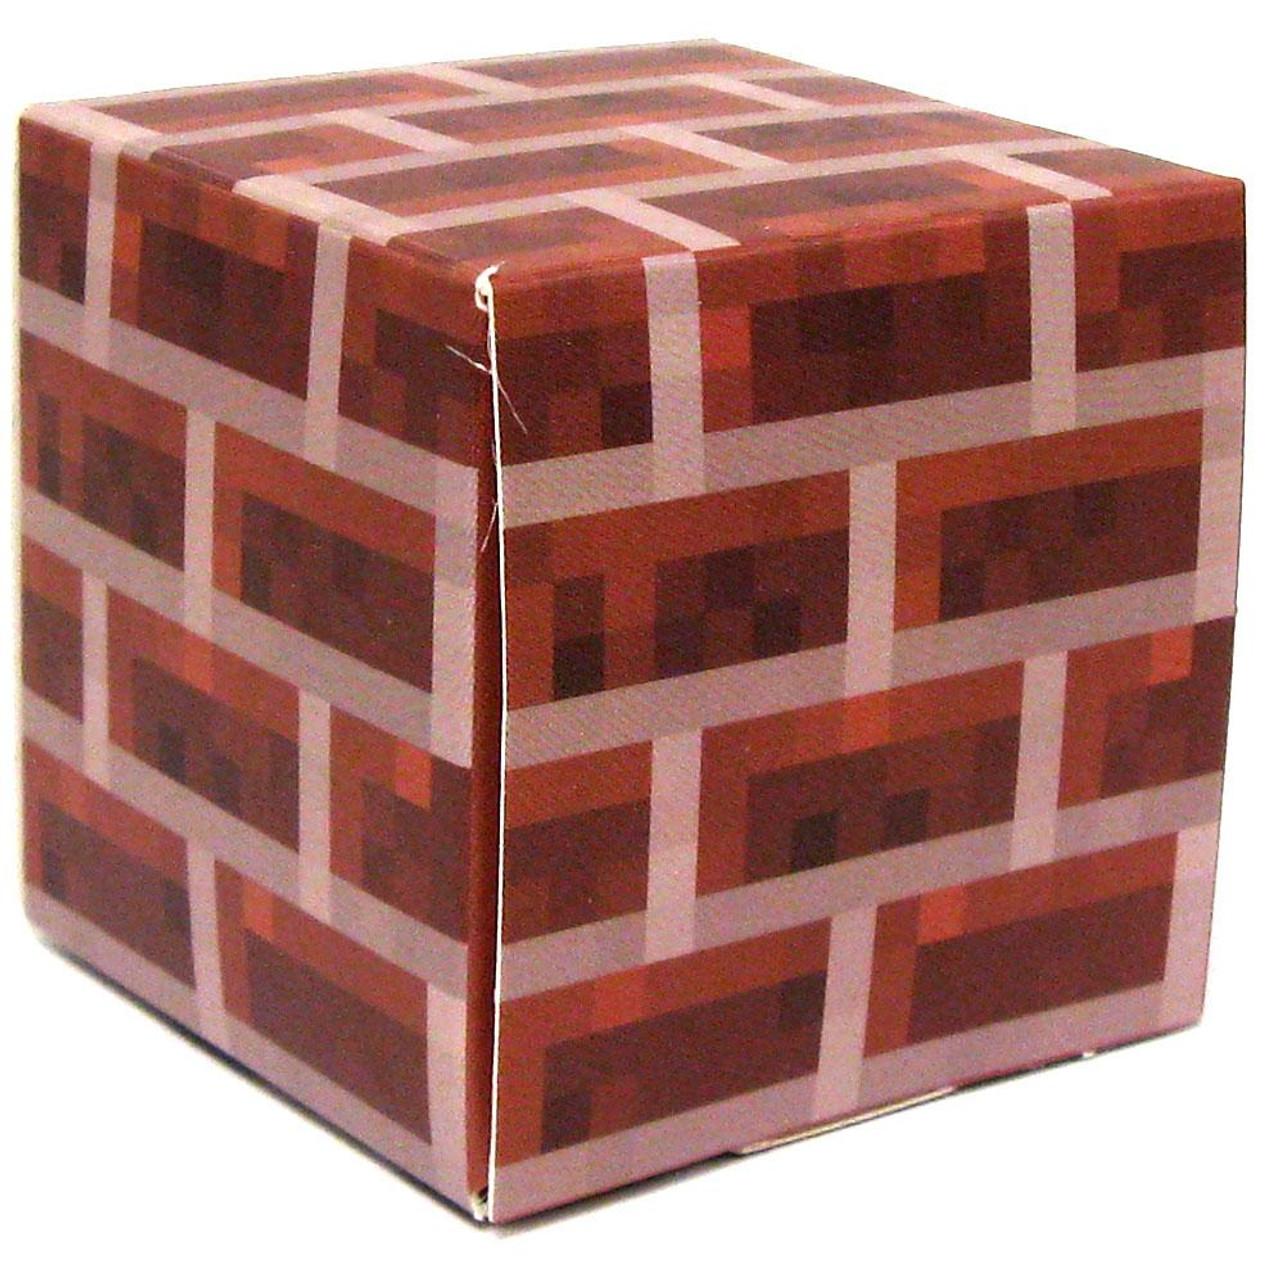 Minecraft Brick Block Papercraft [Single Piece]